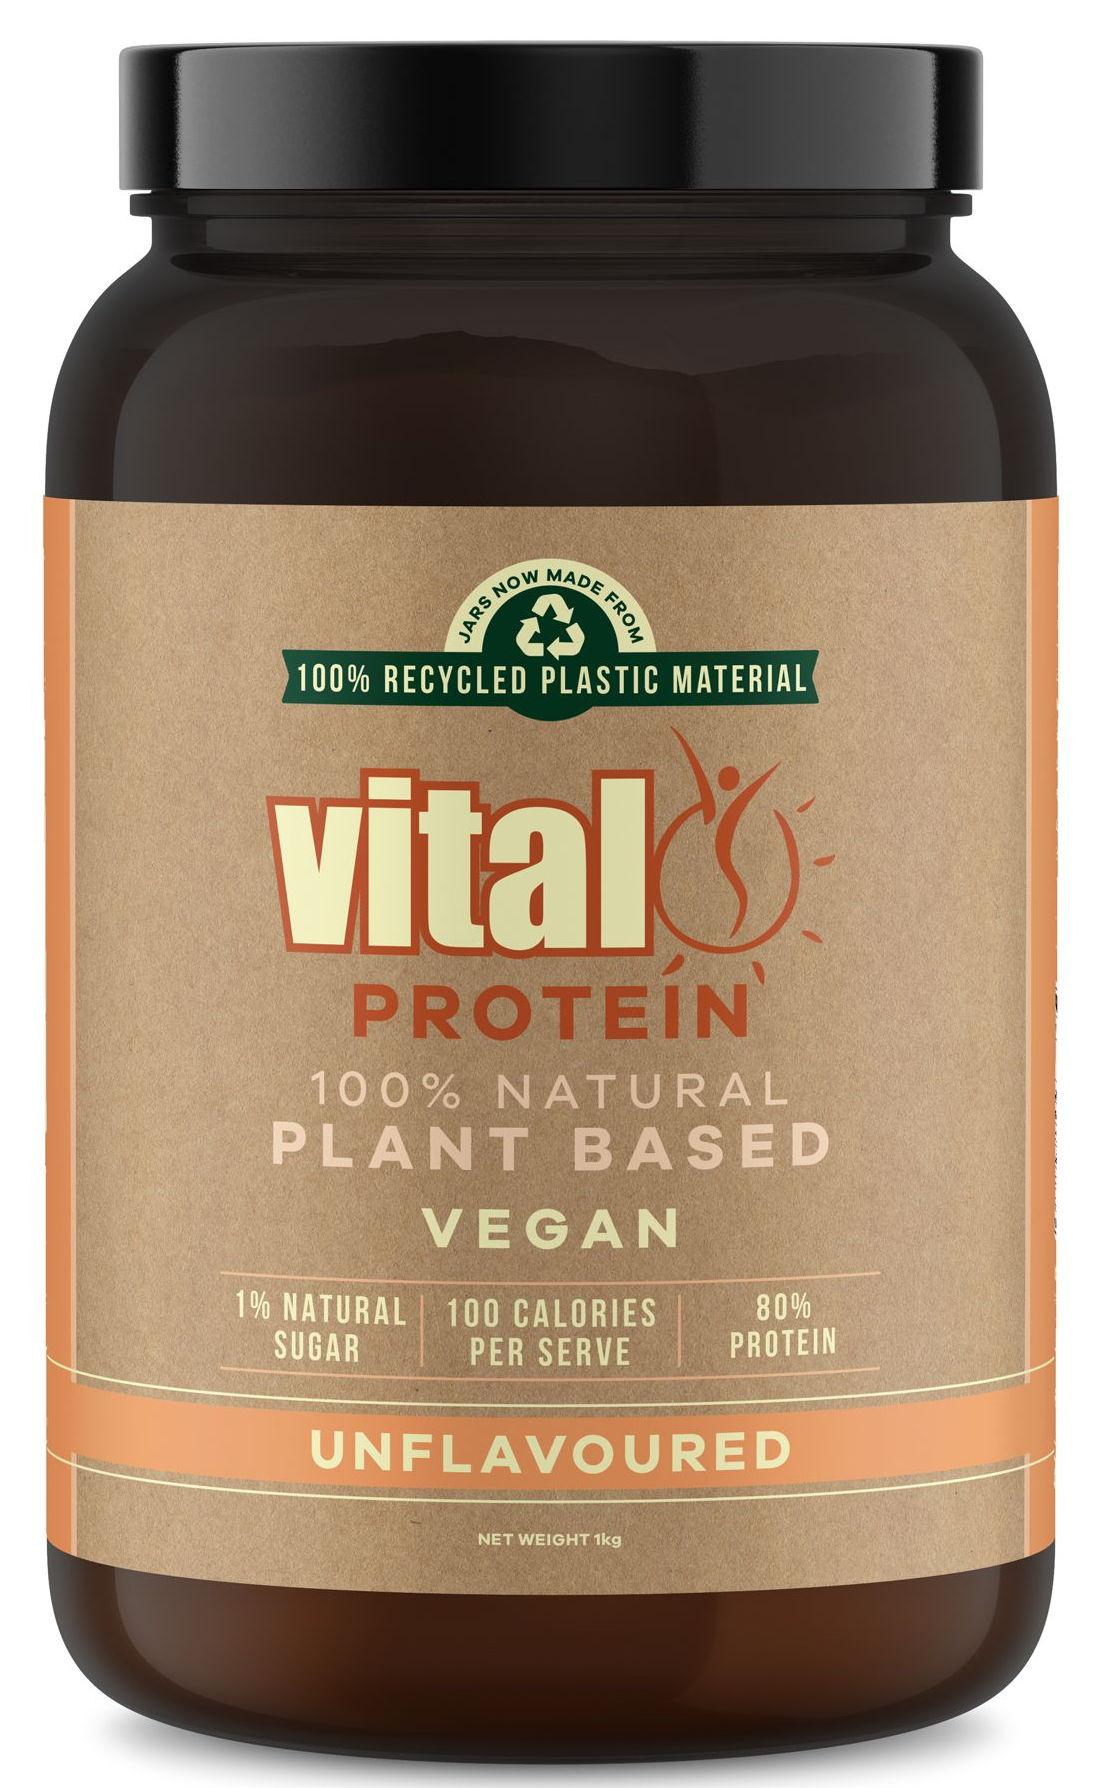 Vital Protein 1kg - Vital Protein Unflavoured :: Pea Protein